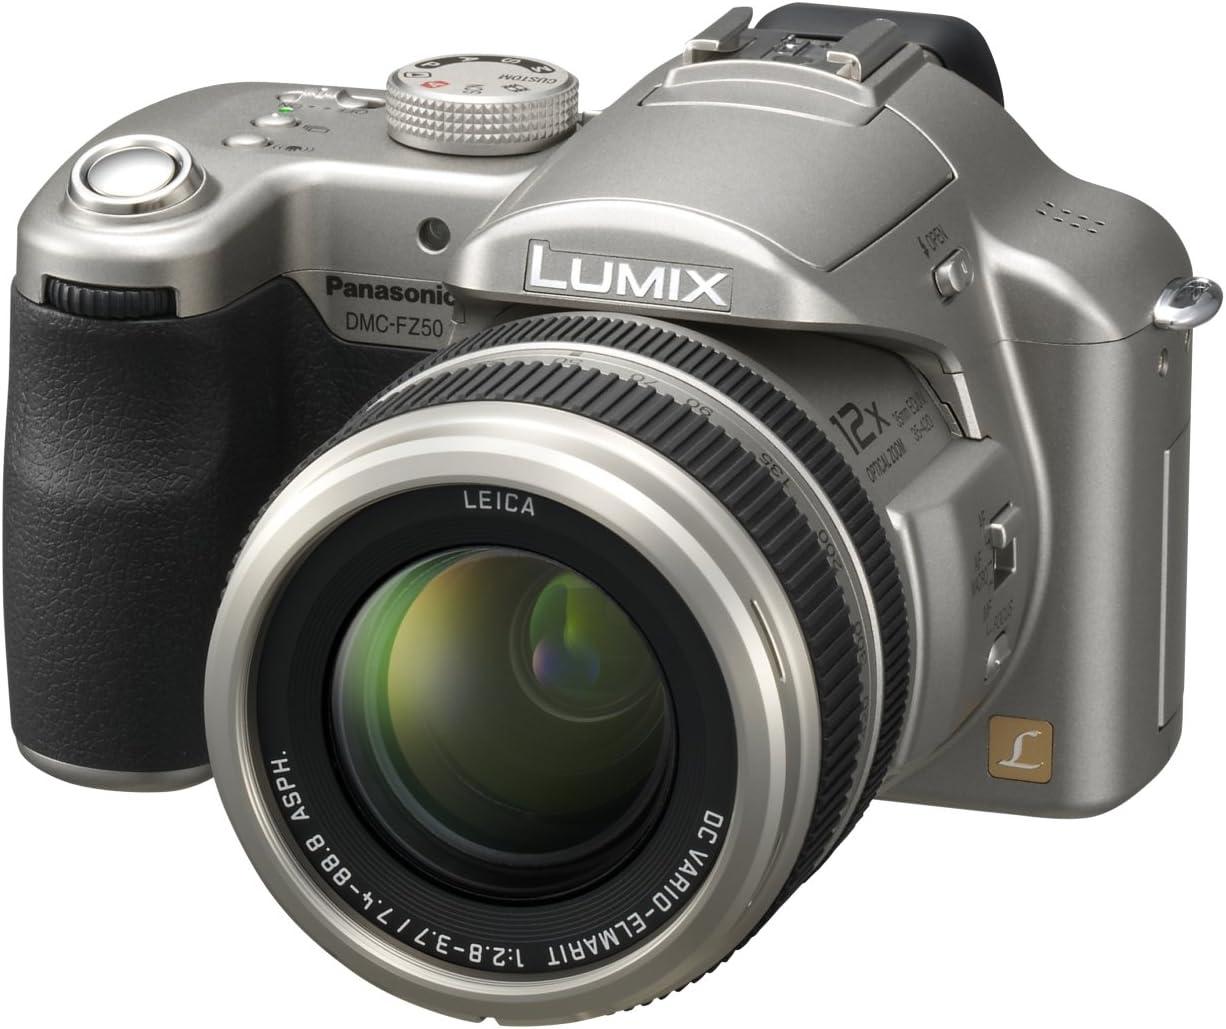 Panasonic Lumix Dmc Fz50 Eg S Digitalkamera 2 Zoll Kamera